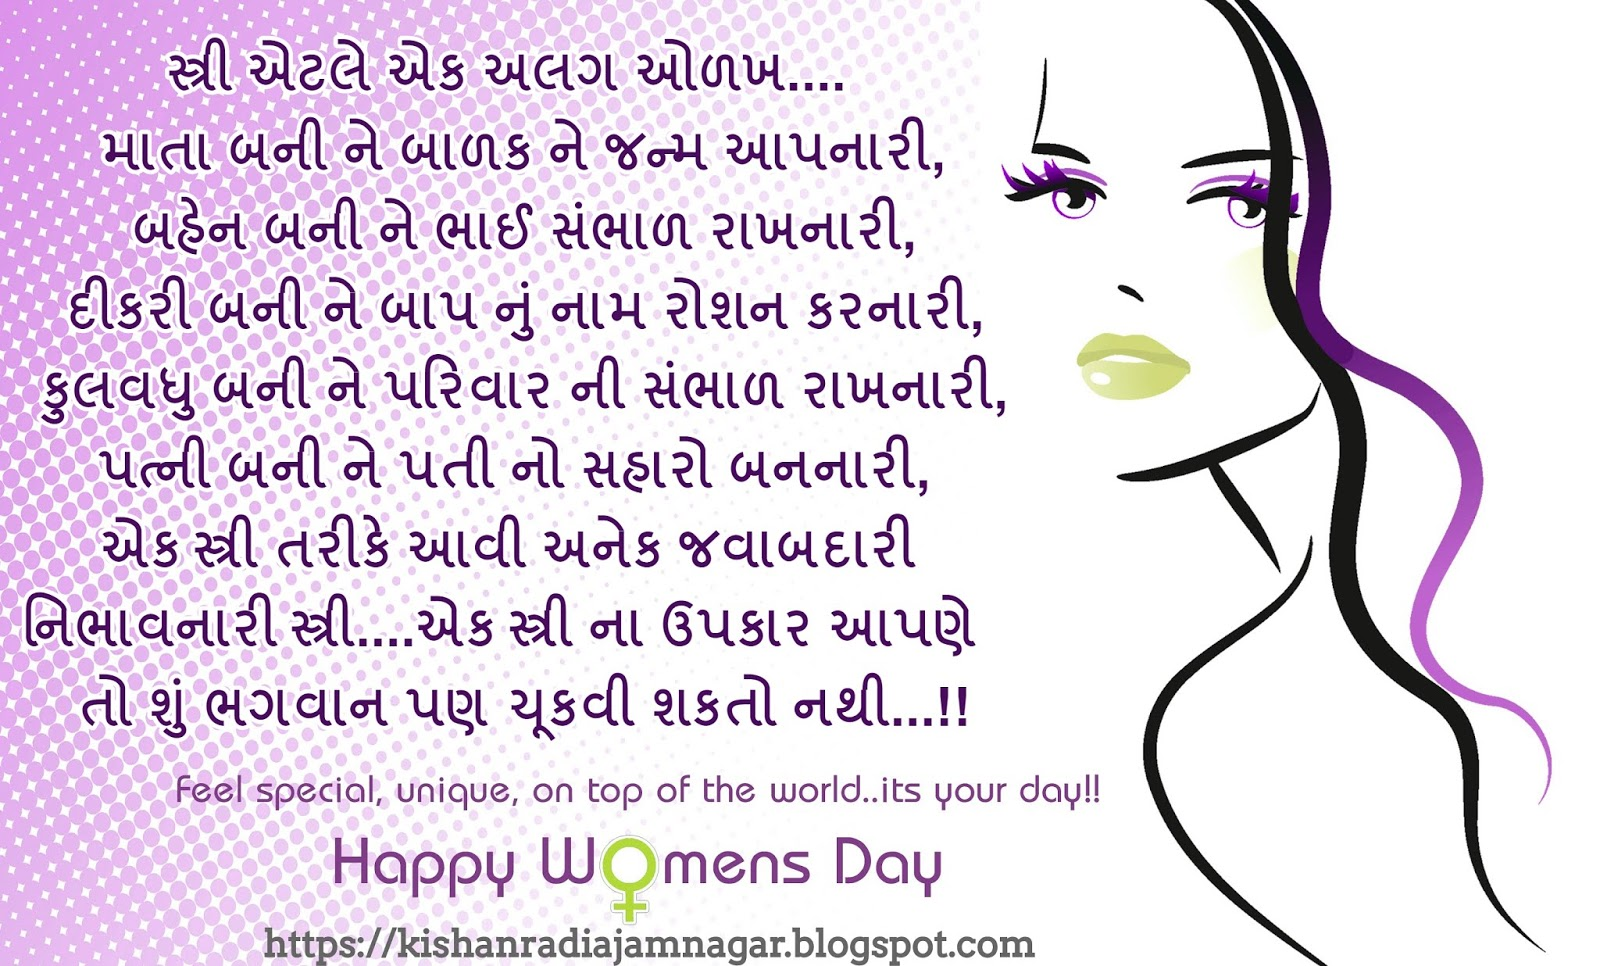 Gujarati Quotes on Women's Day | Gujarati Status on Women's Day